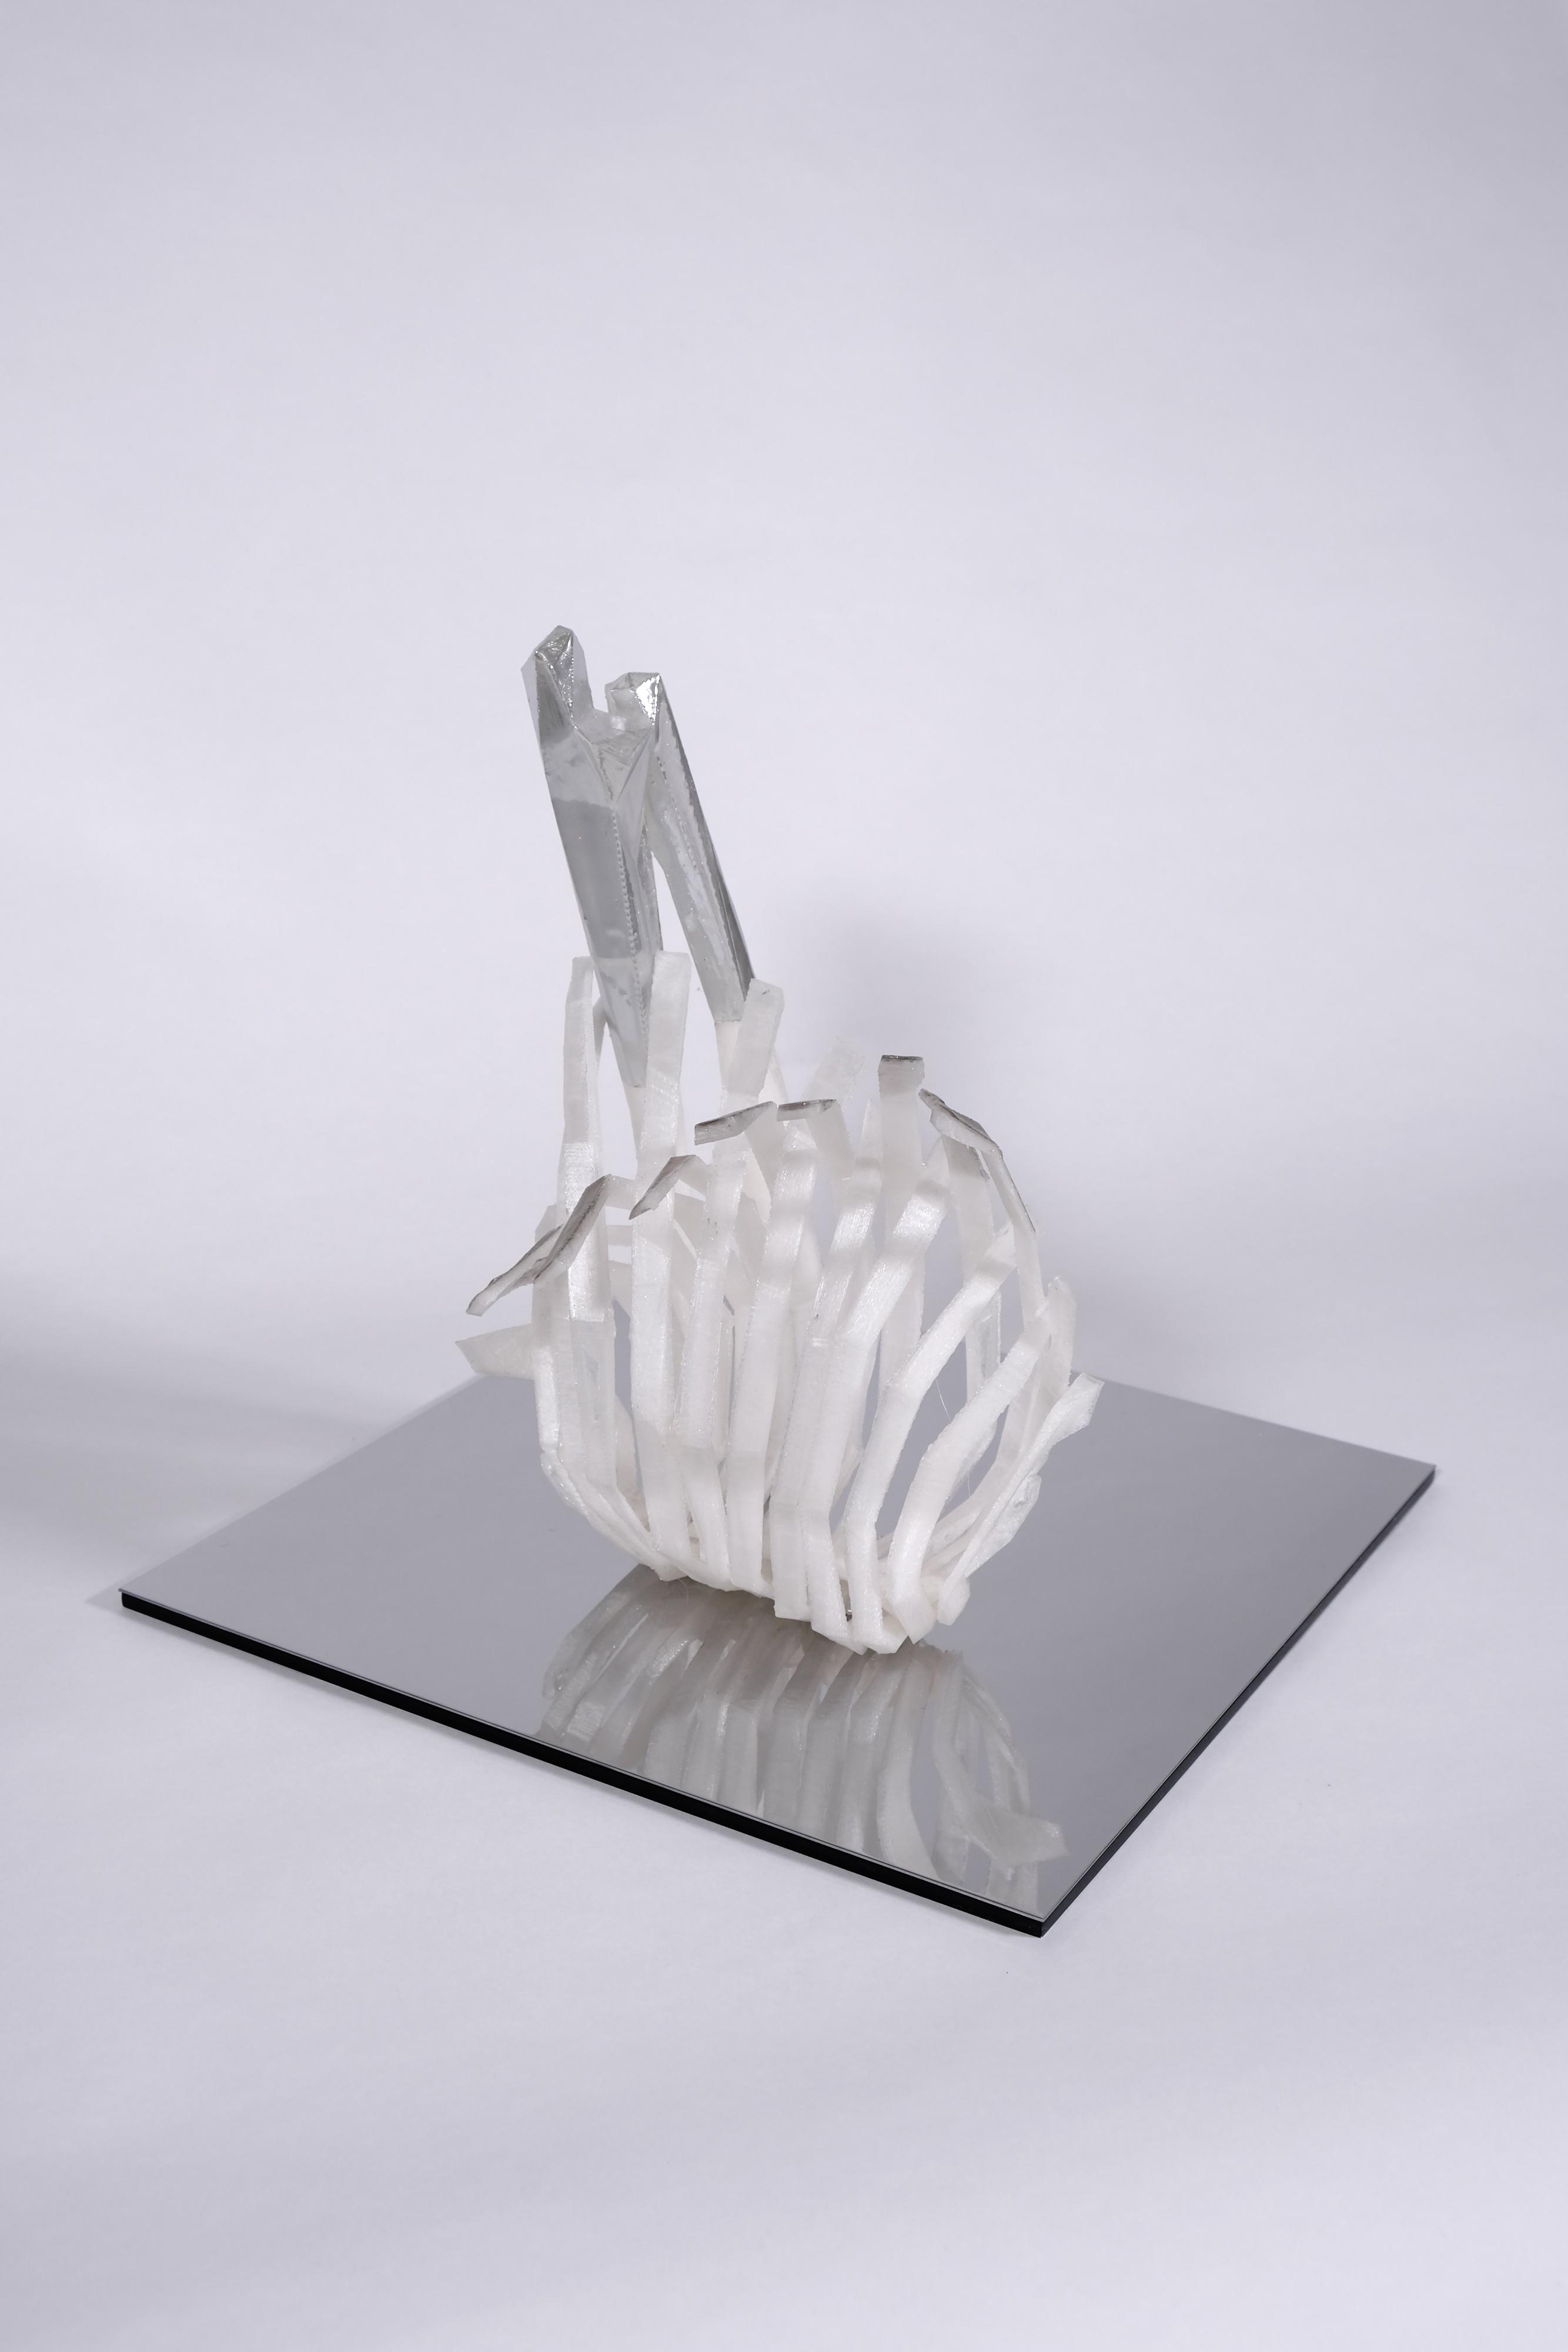 Galerie Barbara Thumm \ New Viewings #23 \ Osias Yanov